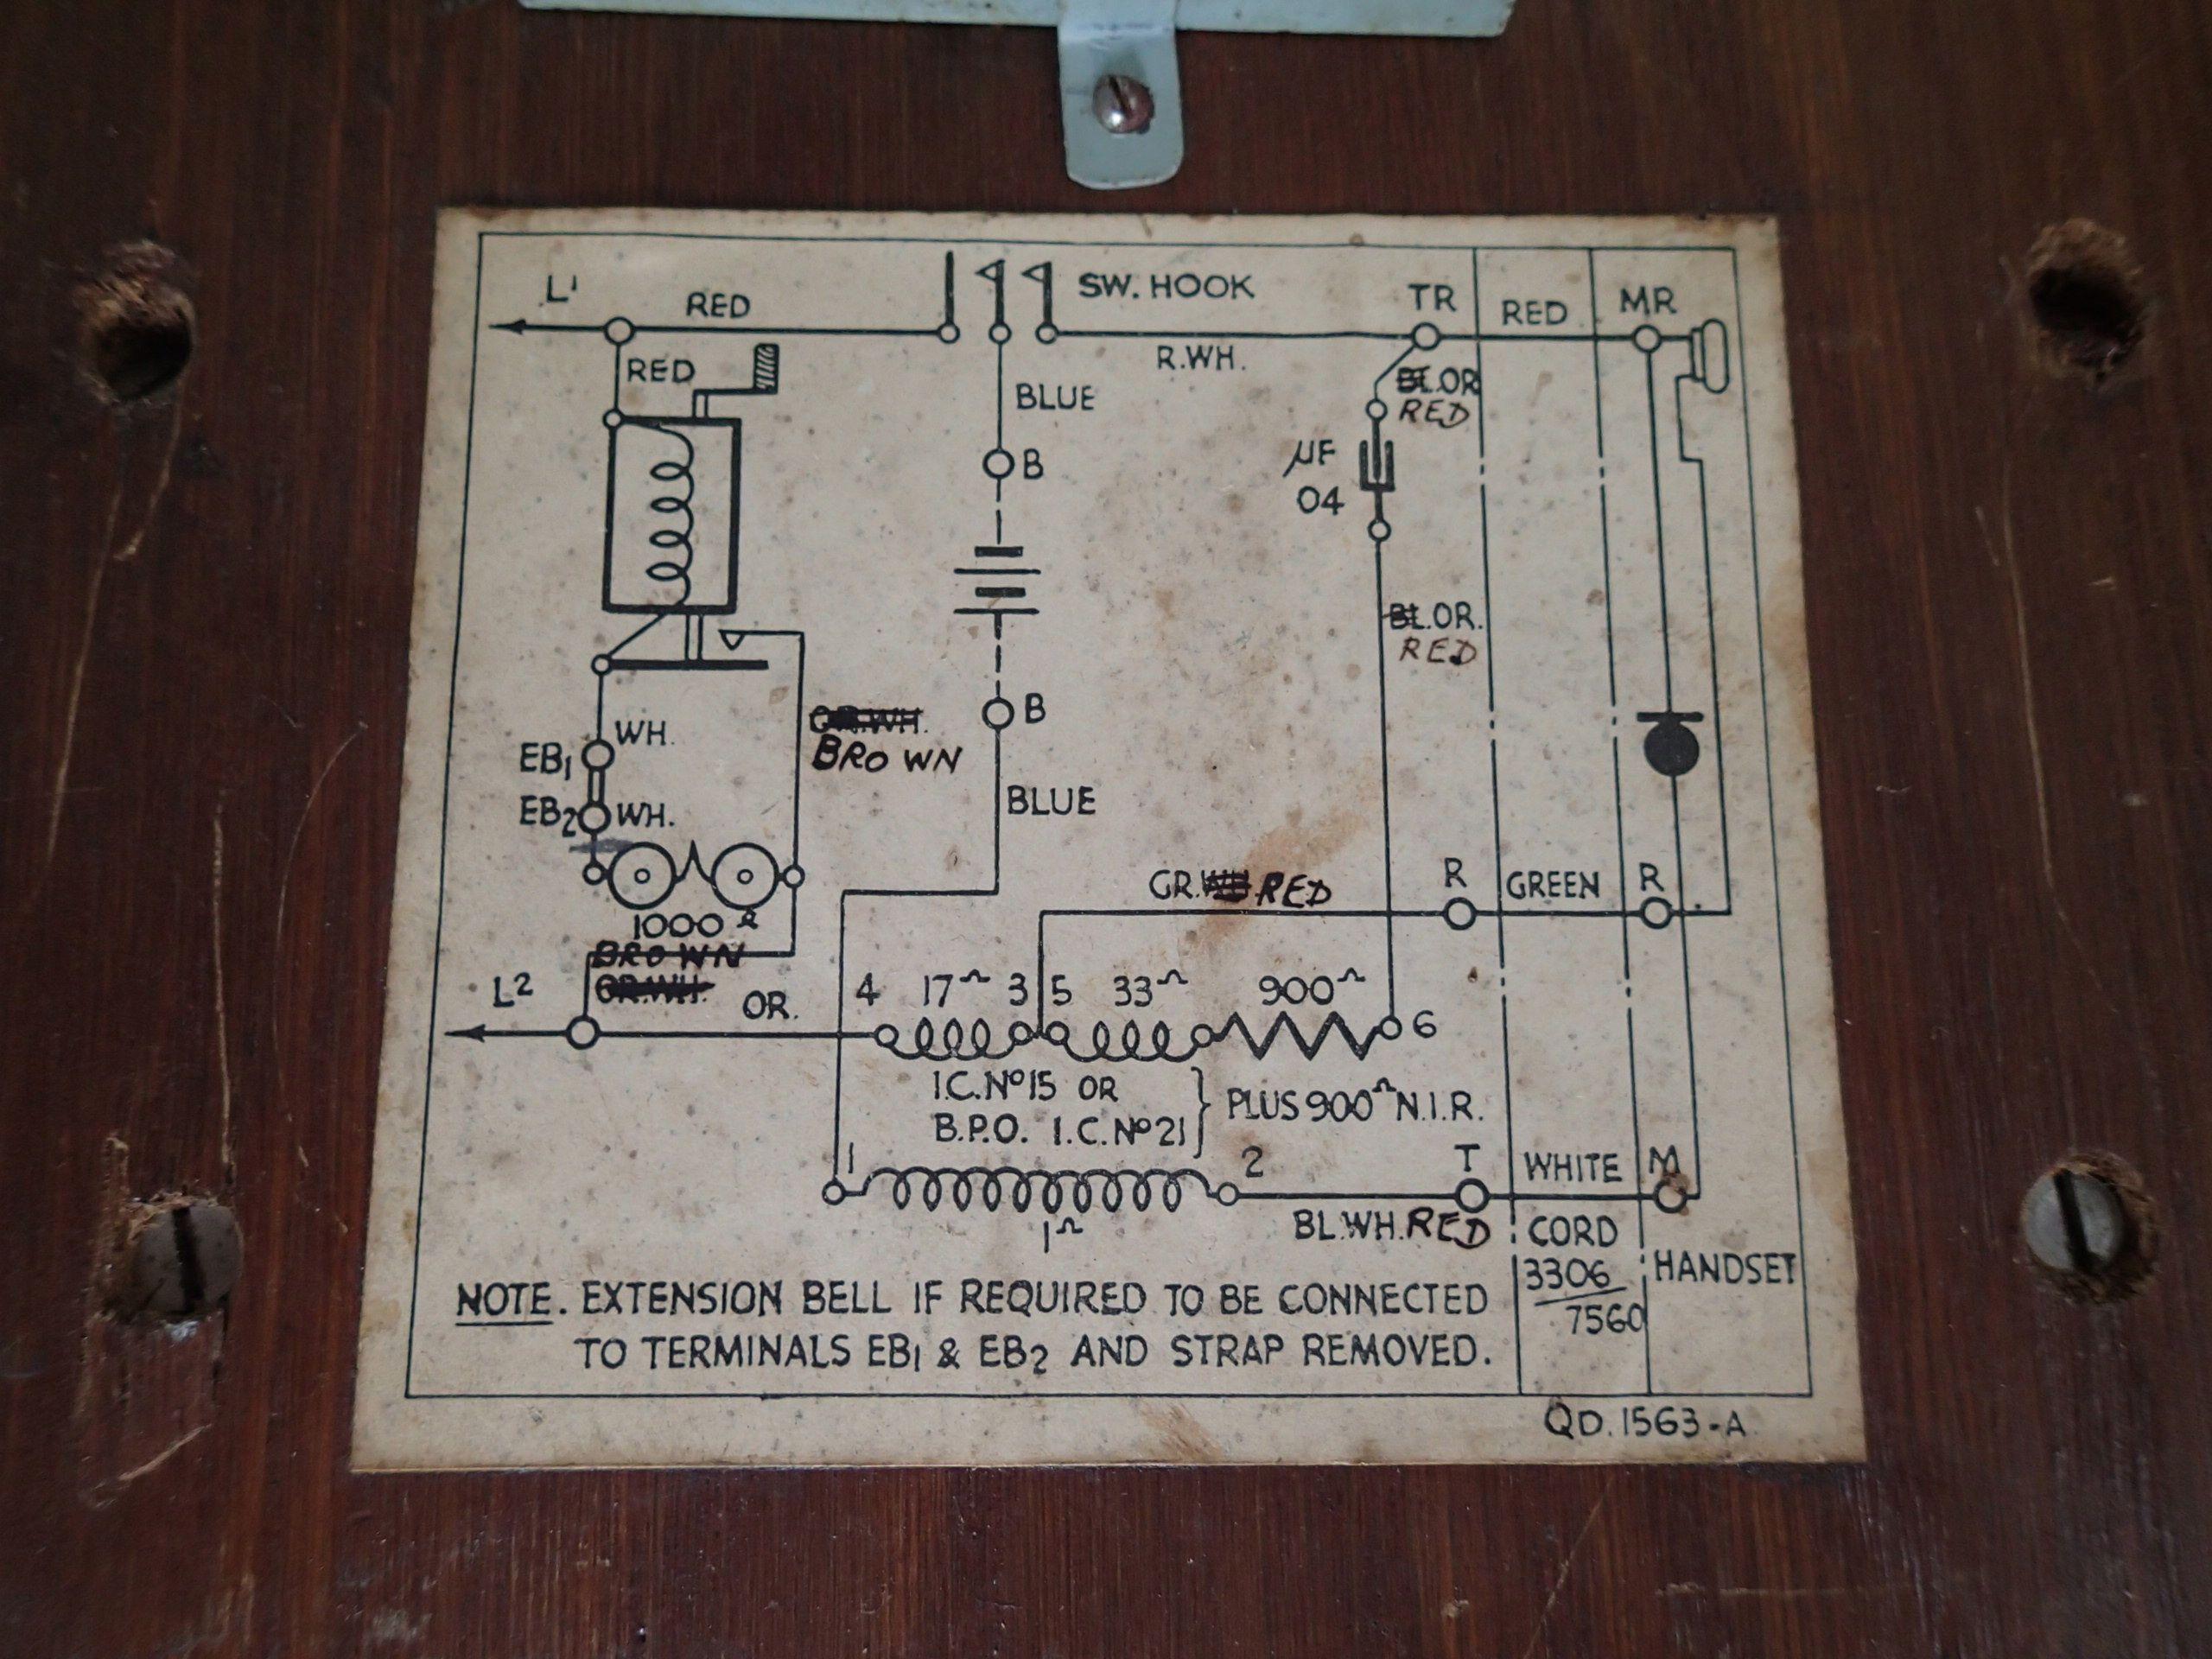 Kellogg Telephone Wiring Diagram - General Wiring Diagrams on